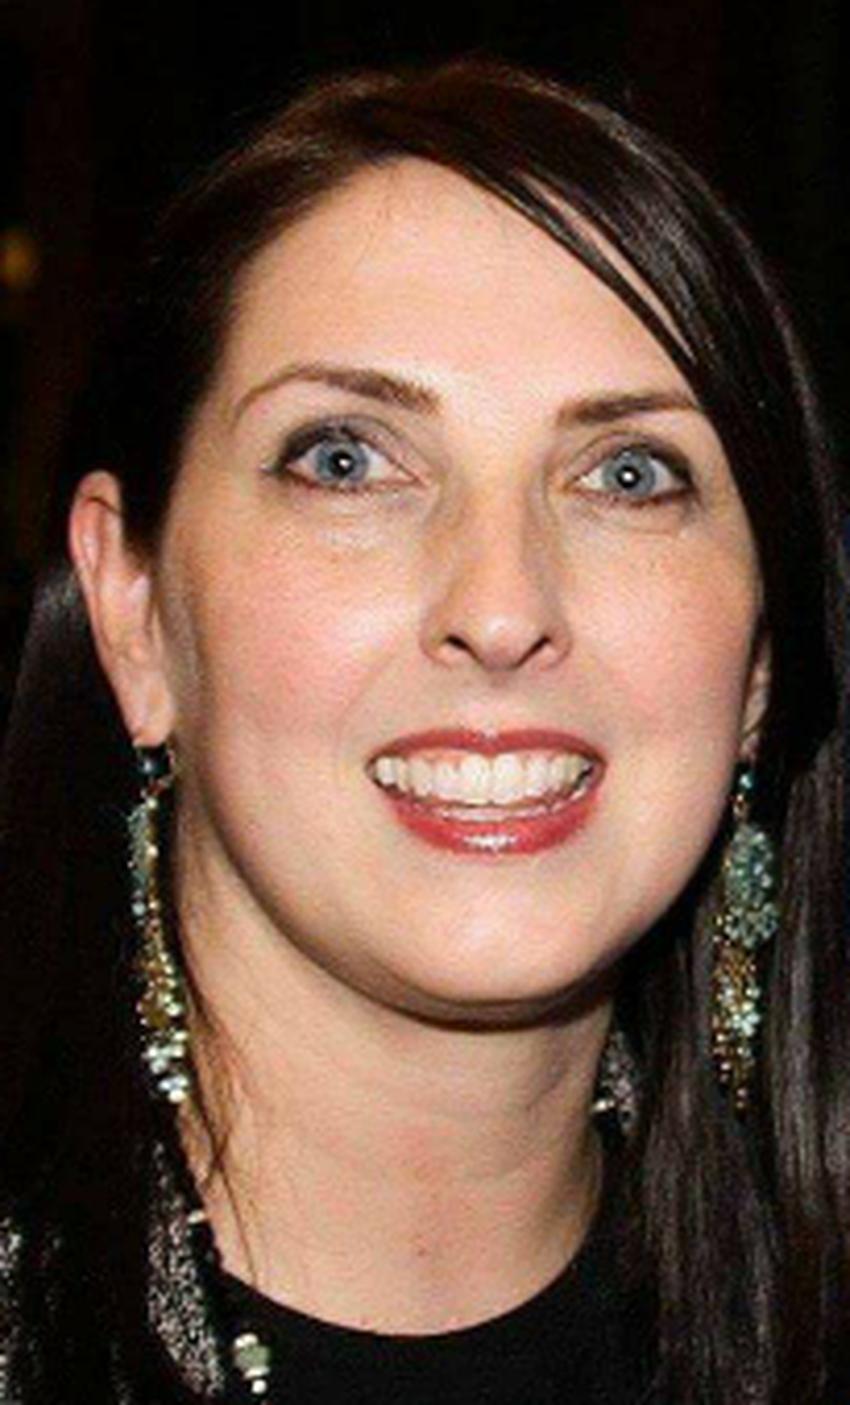 Ronna Romney McDaniel | Wiki & Bio | Everipedia, the encyclopedia of ...